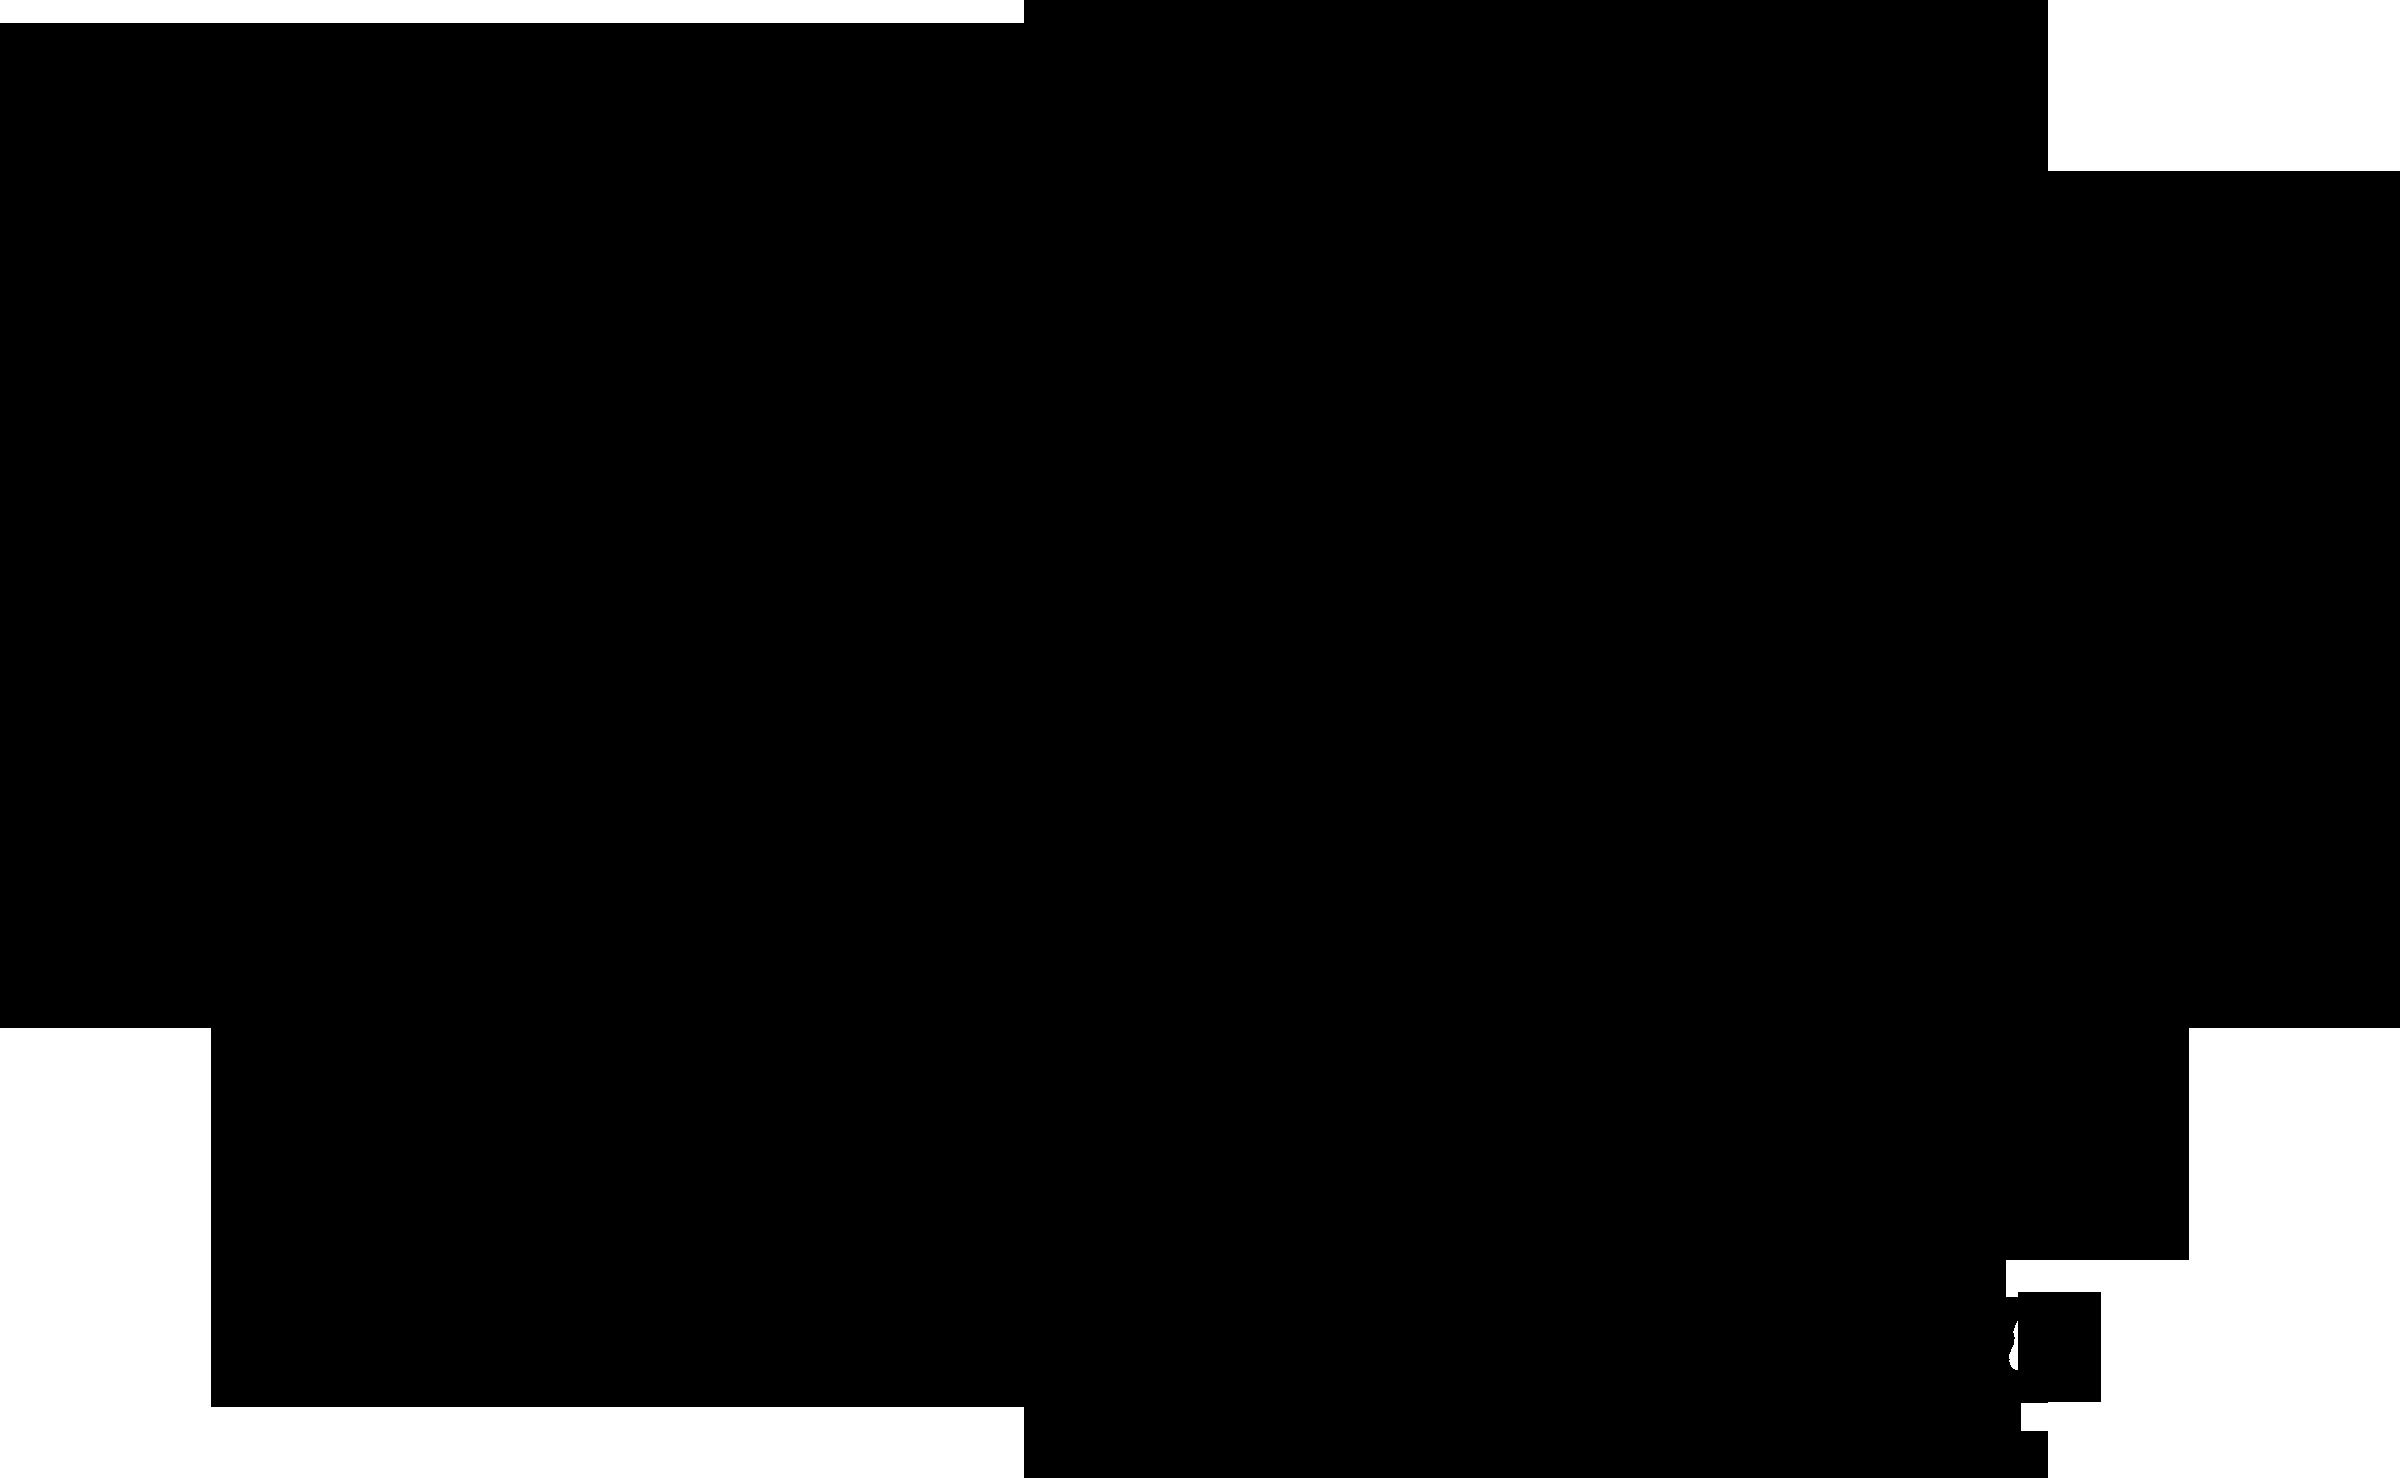 black-okm-doorsign.png